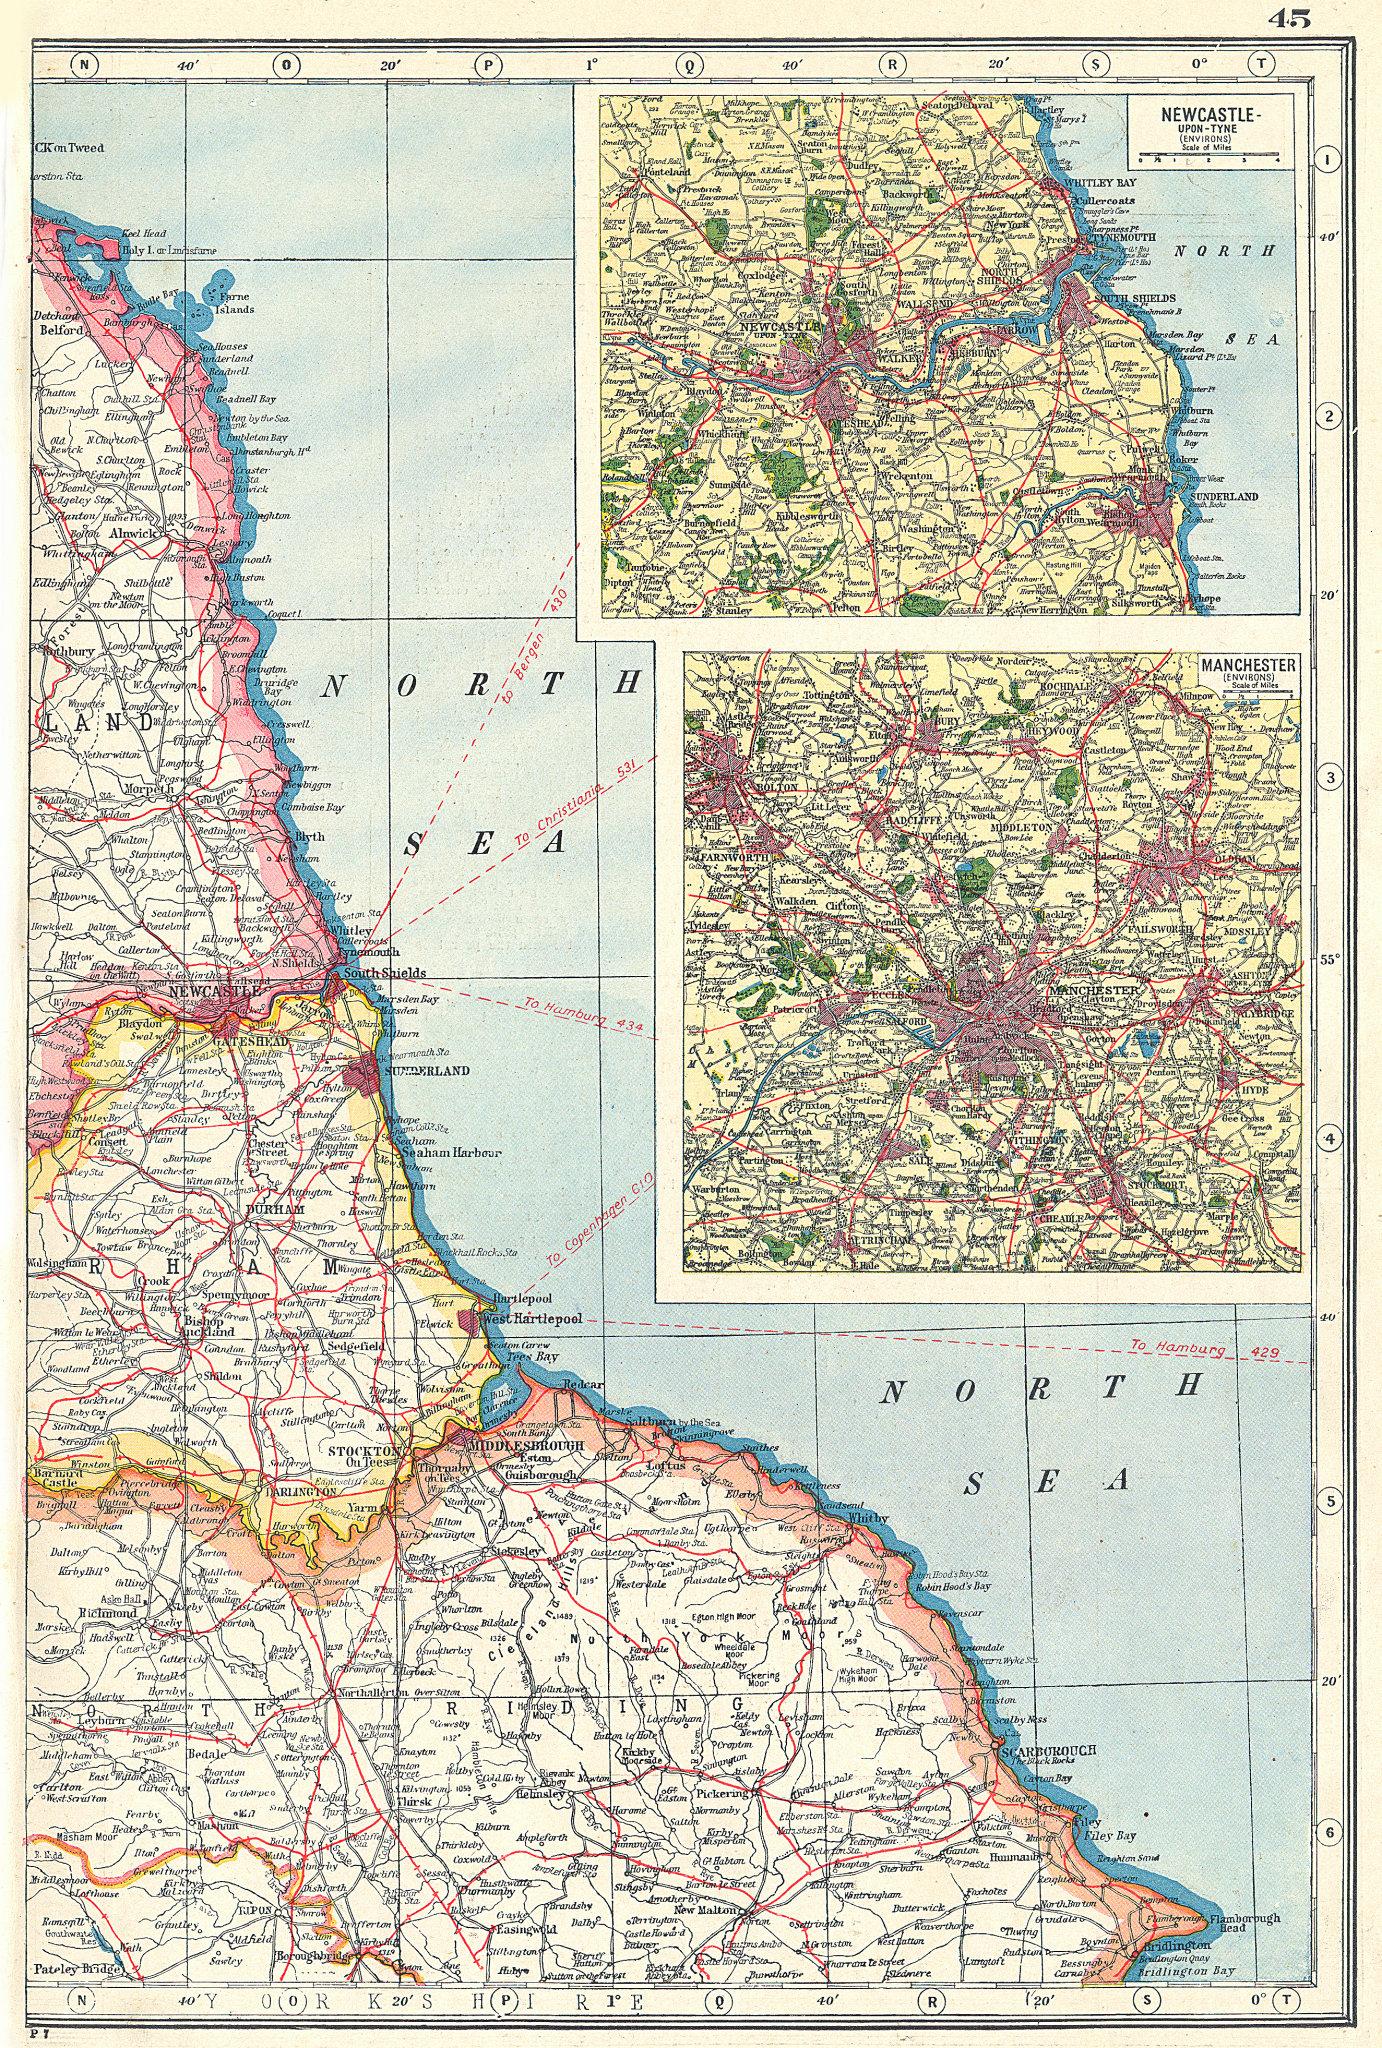 Associate Product NORTH EAST ENGLAND COAST. Durham Yorks Northumbs Newcastle-upon-Tyne 1920 map